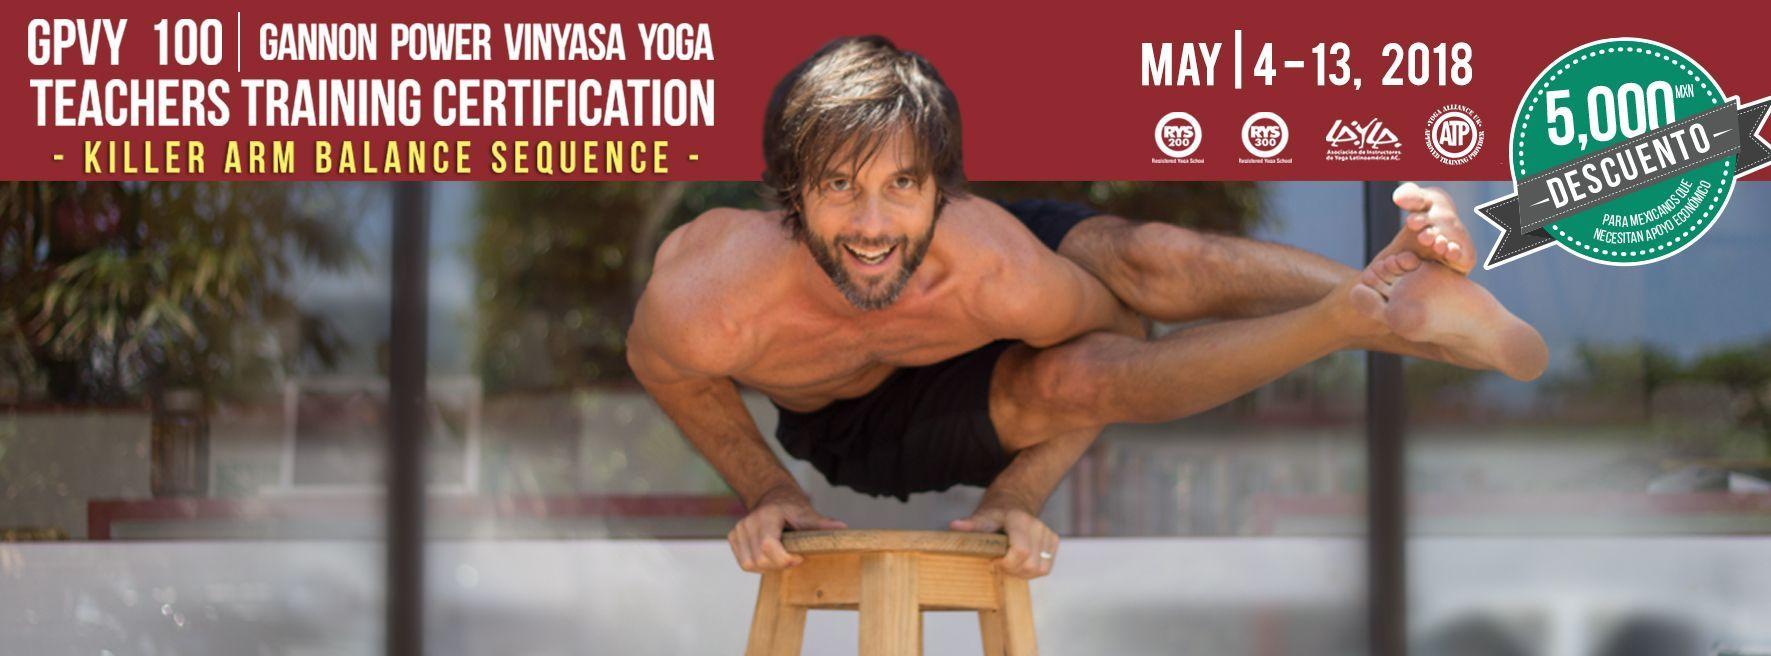 Gannon Power Vinyasa Yoga Teacher Training GPVY 100